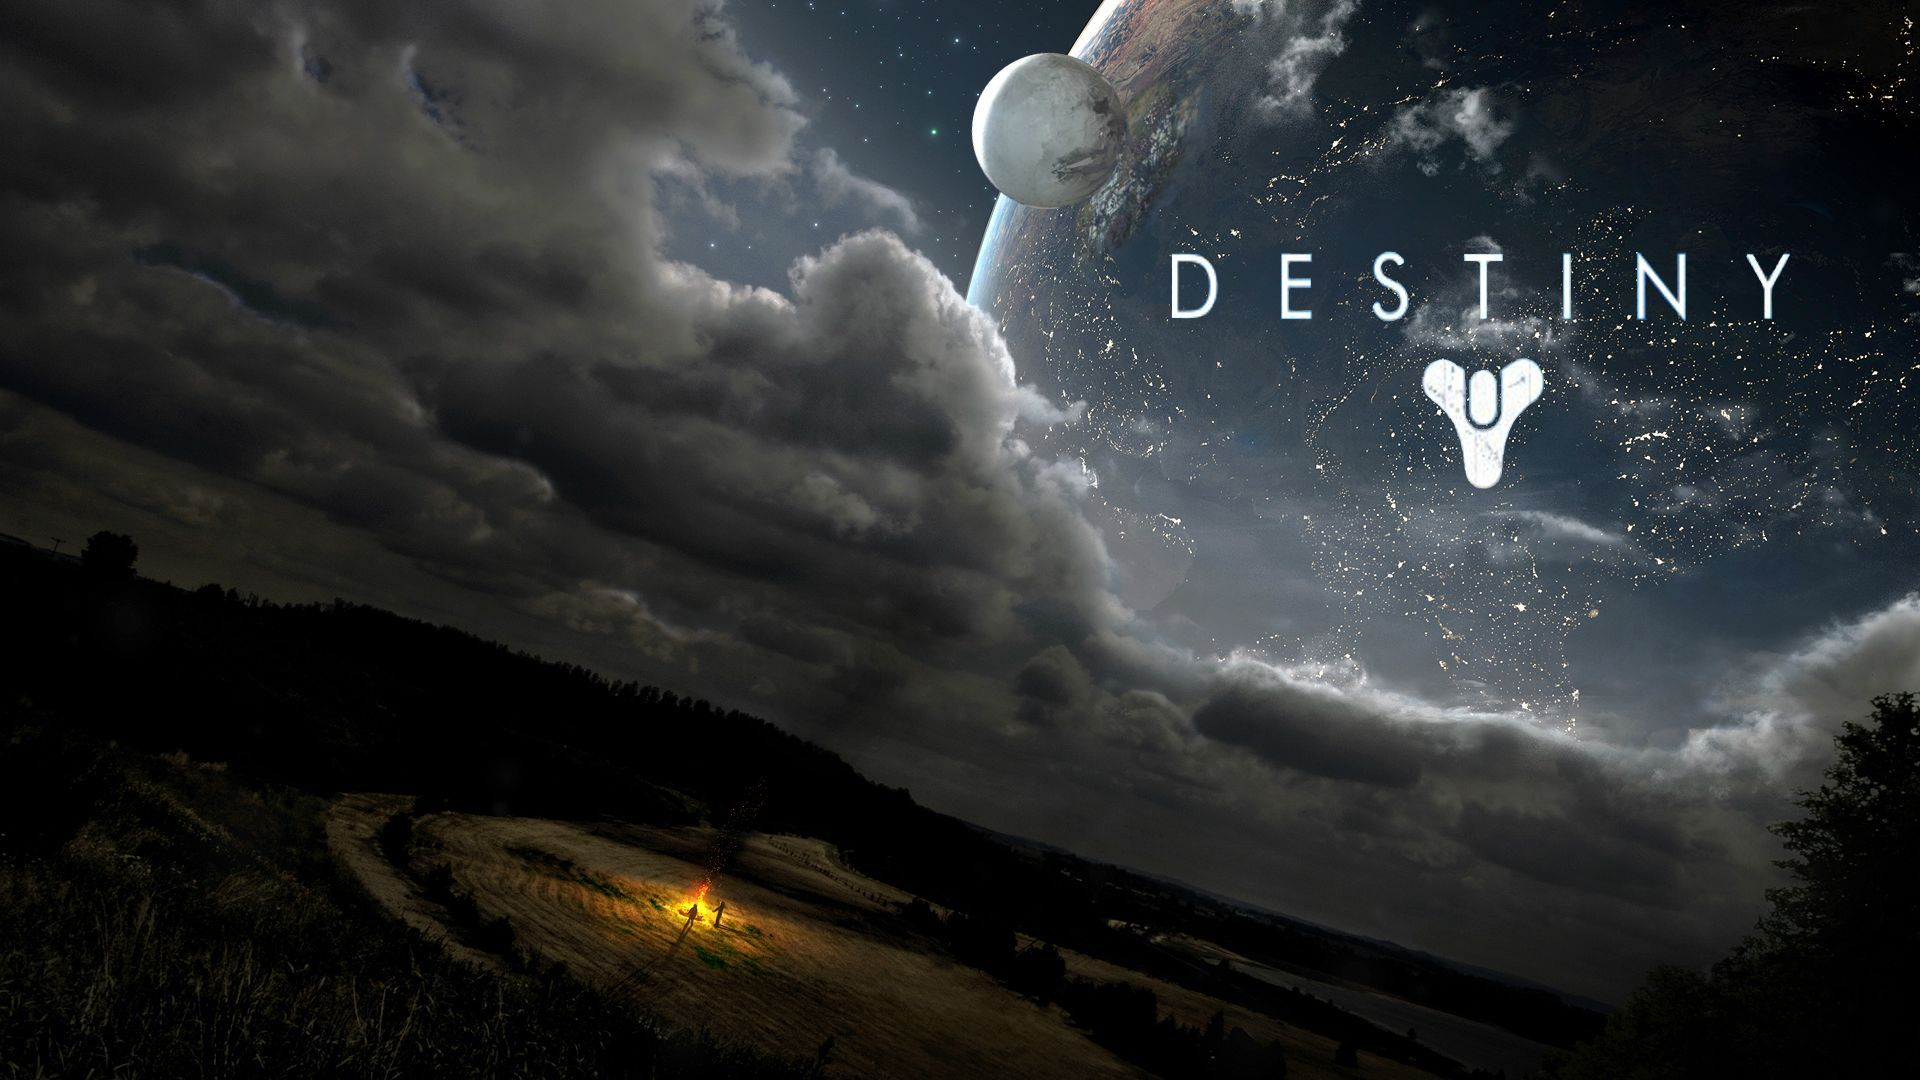 Destiny Wallpaper Google Search Bad Azz Video Games Destiny Wallpaper Hd Destiny Backgrounds Destiny